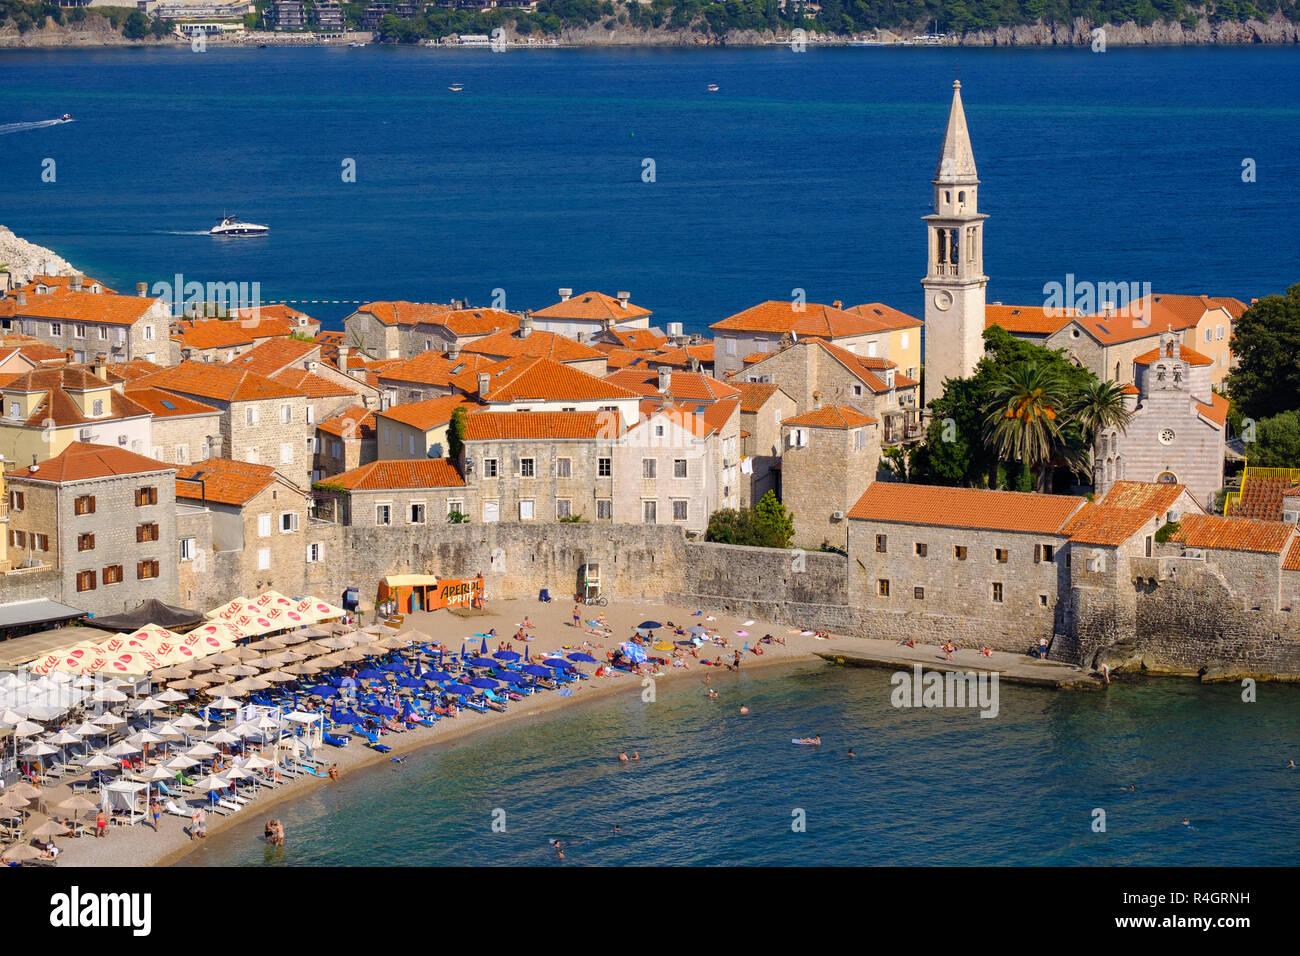 Old town with city beach, Budva, Adriatic coast, Montenegro - Stock Image